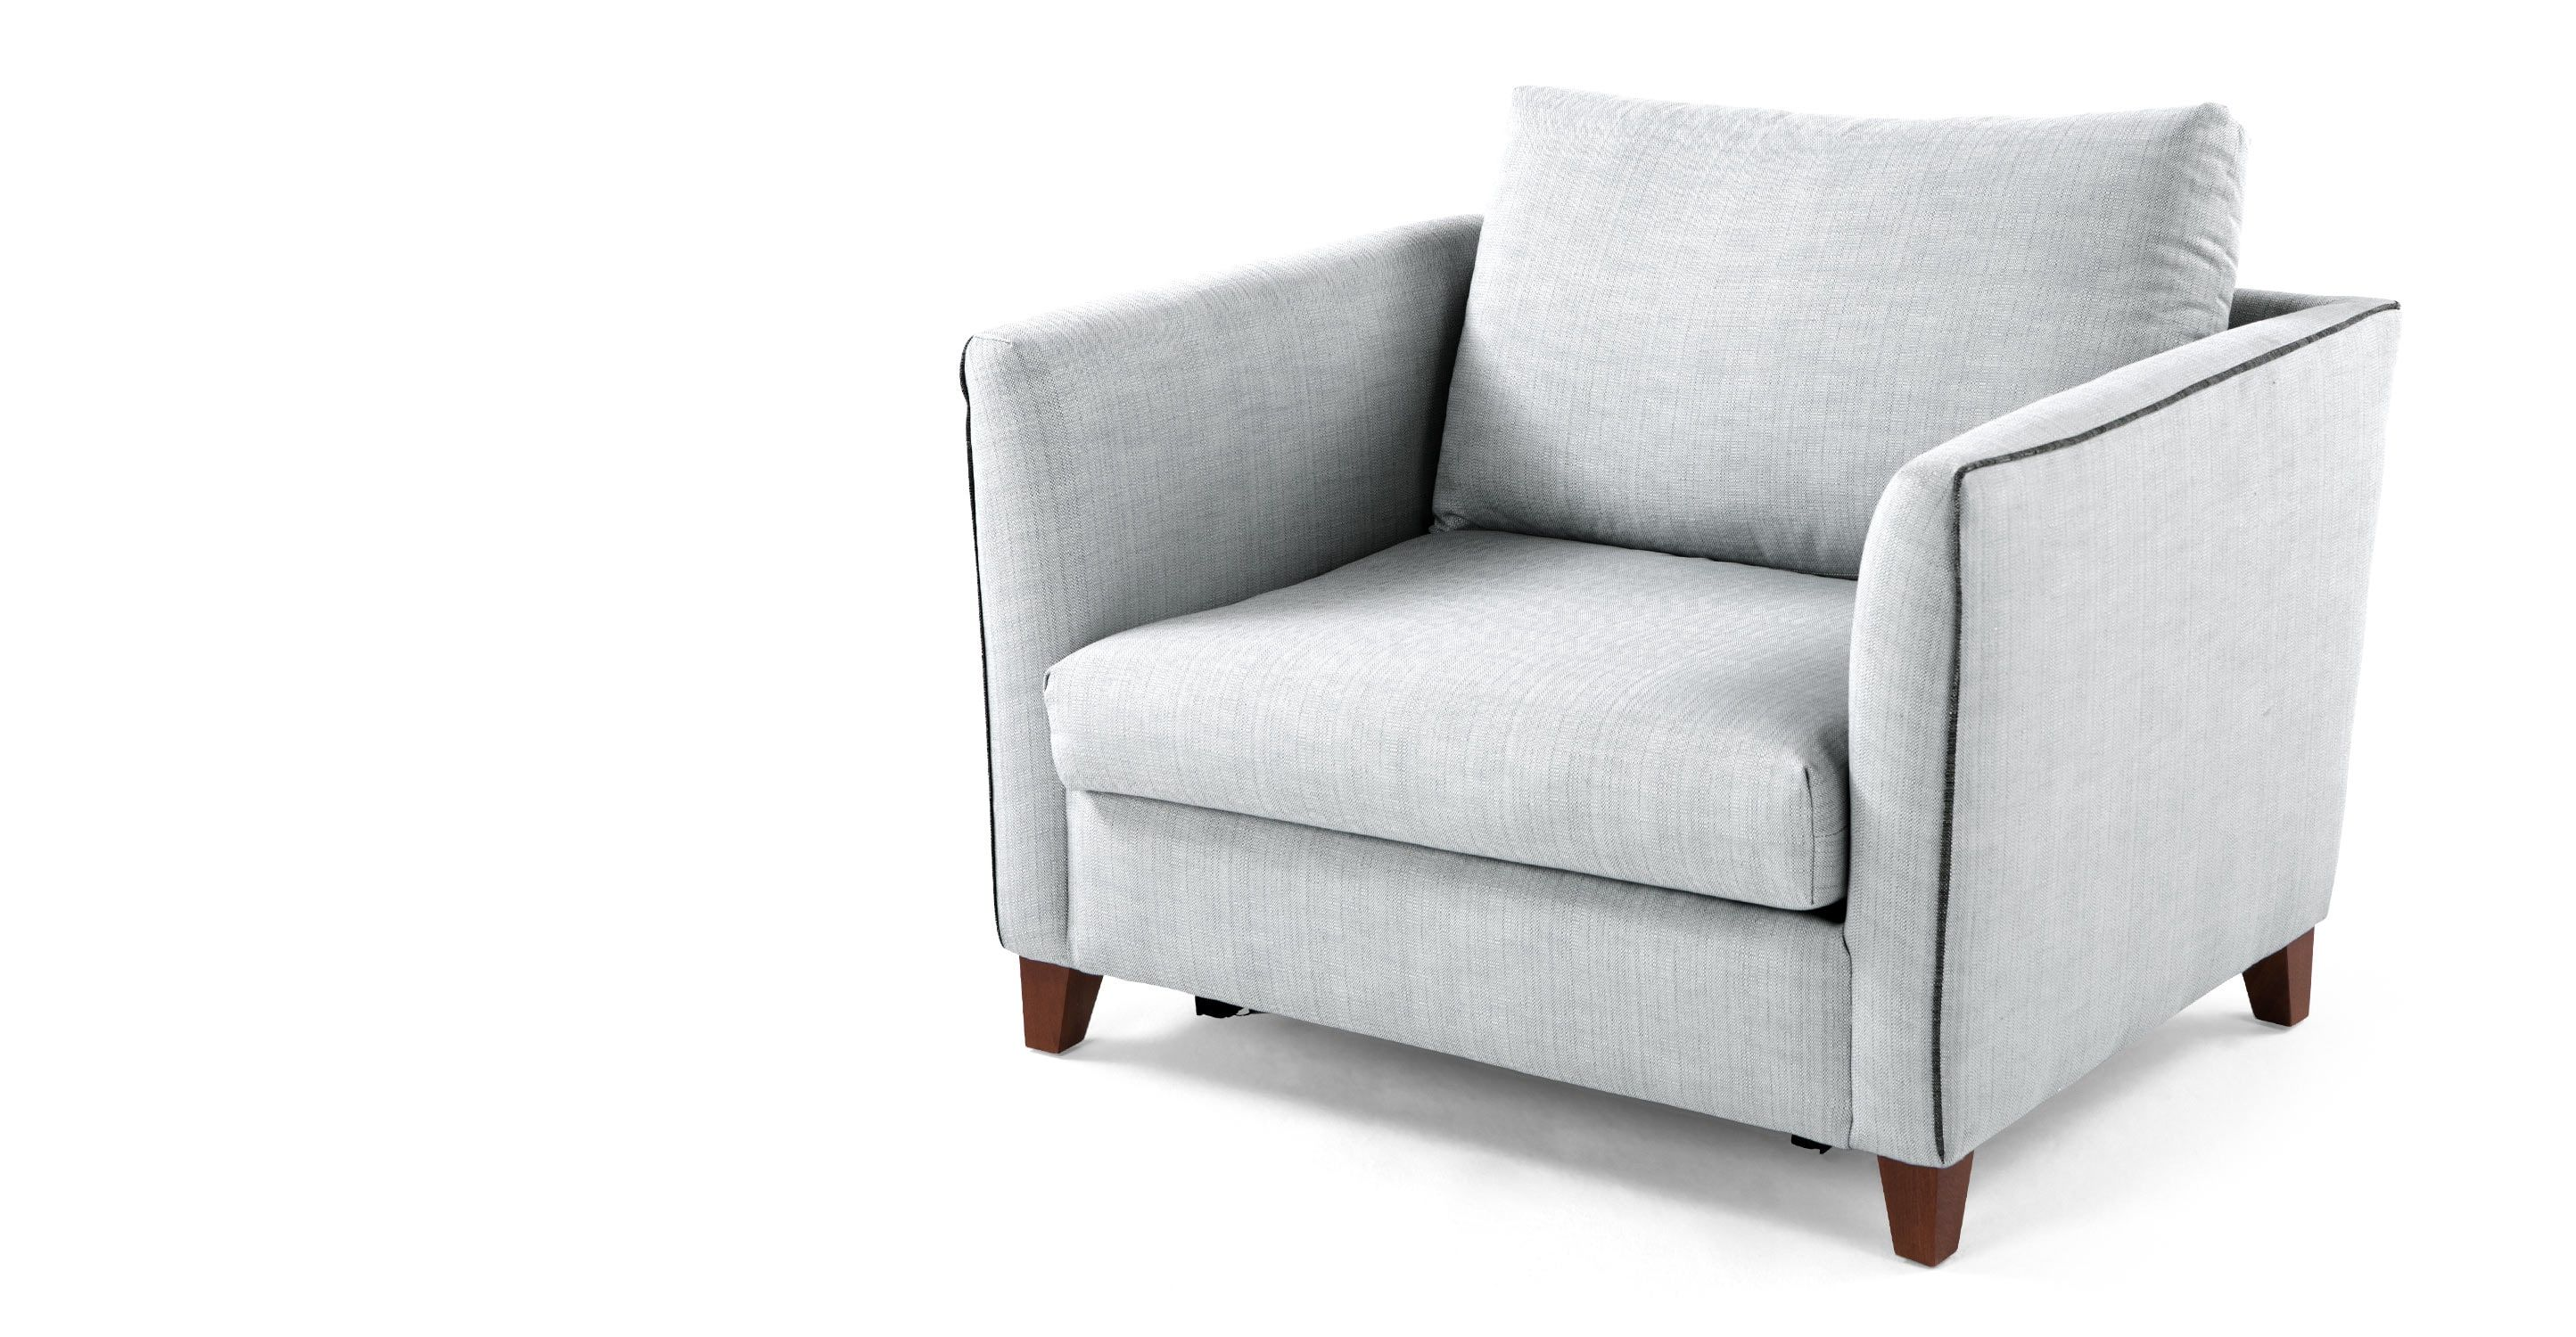 Bari Snuggler Sofa Bed Malva Blue Grey